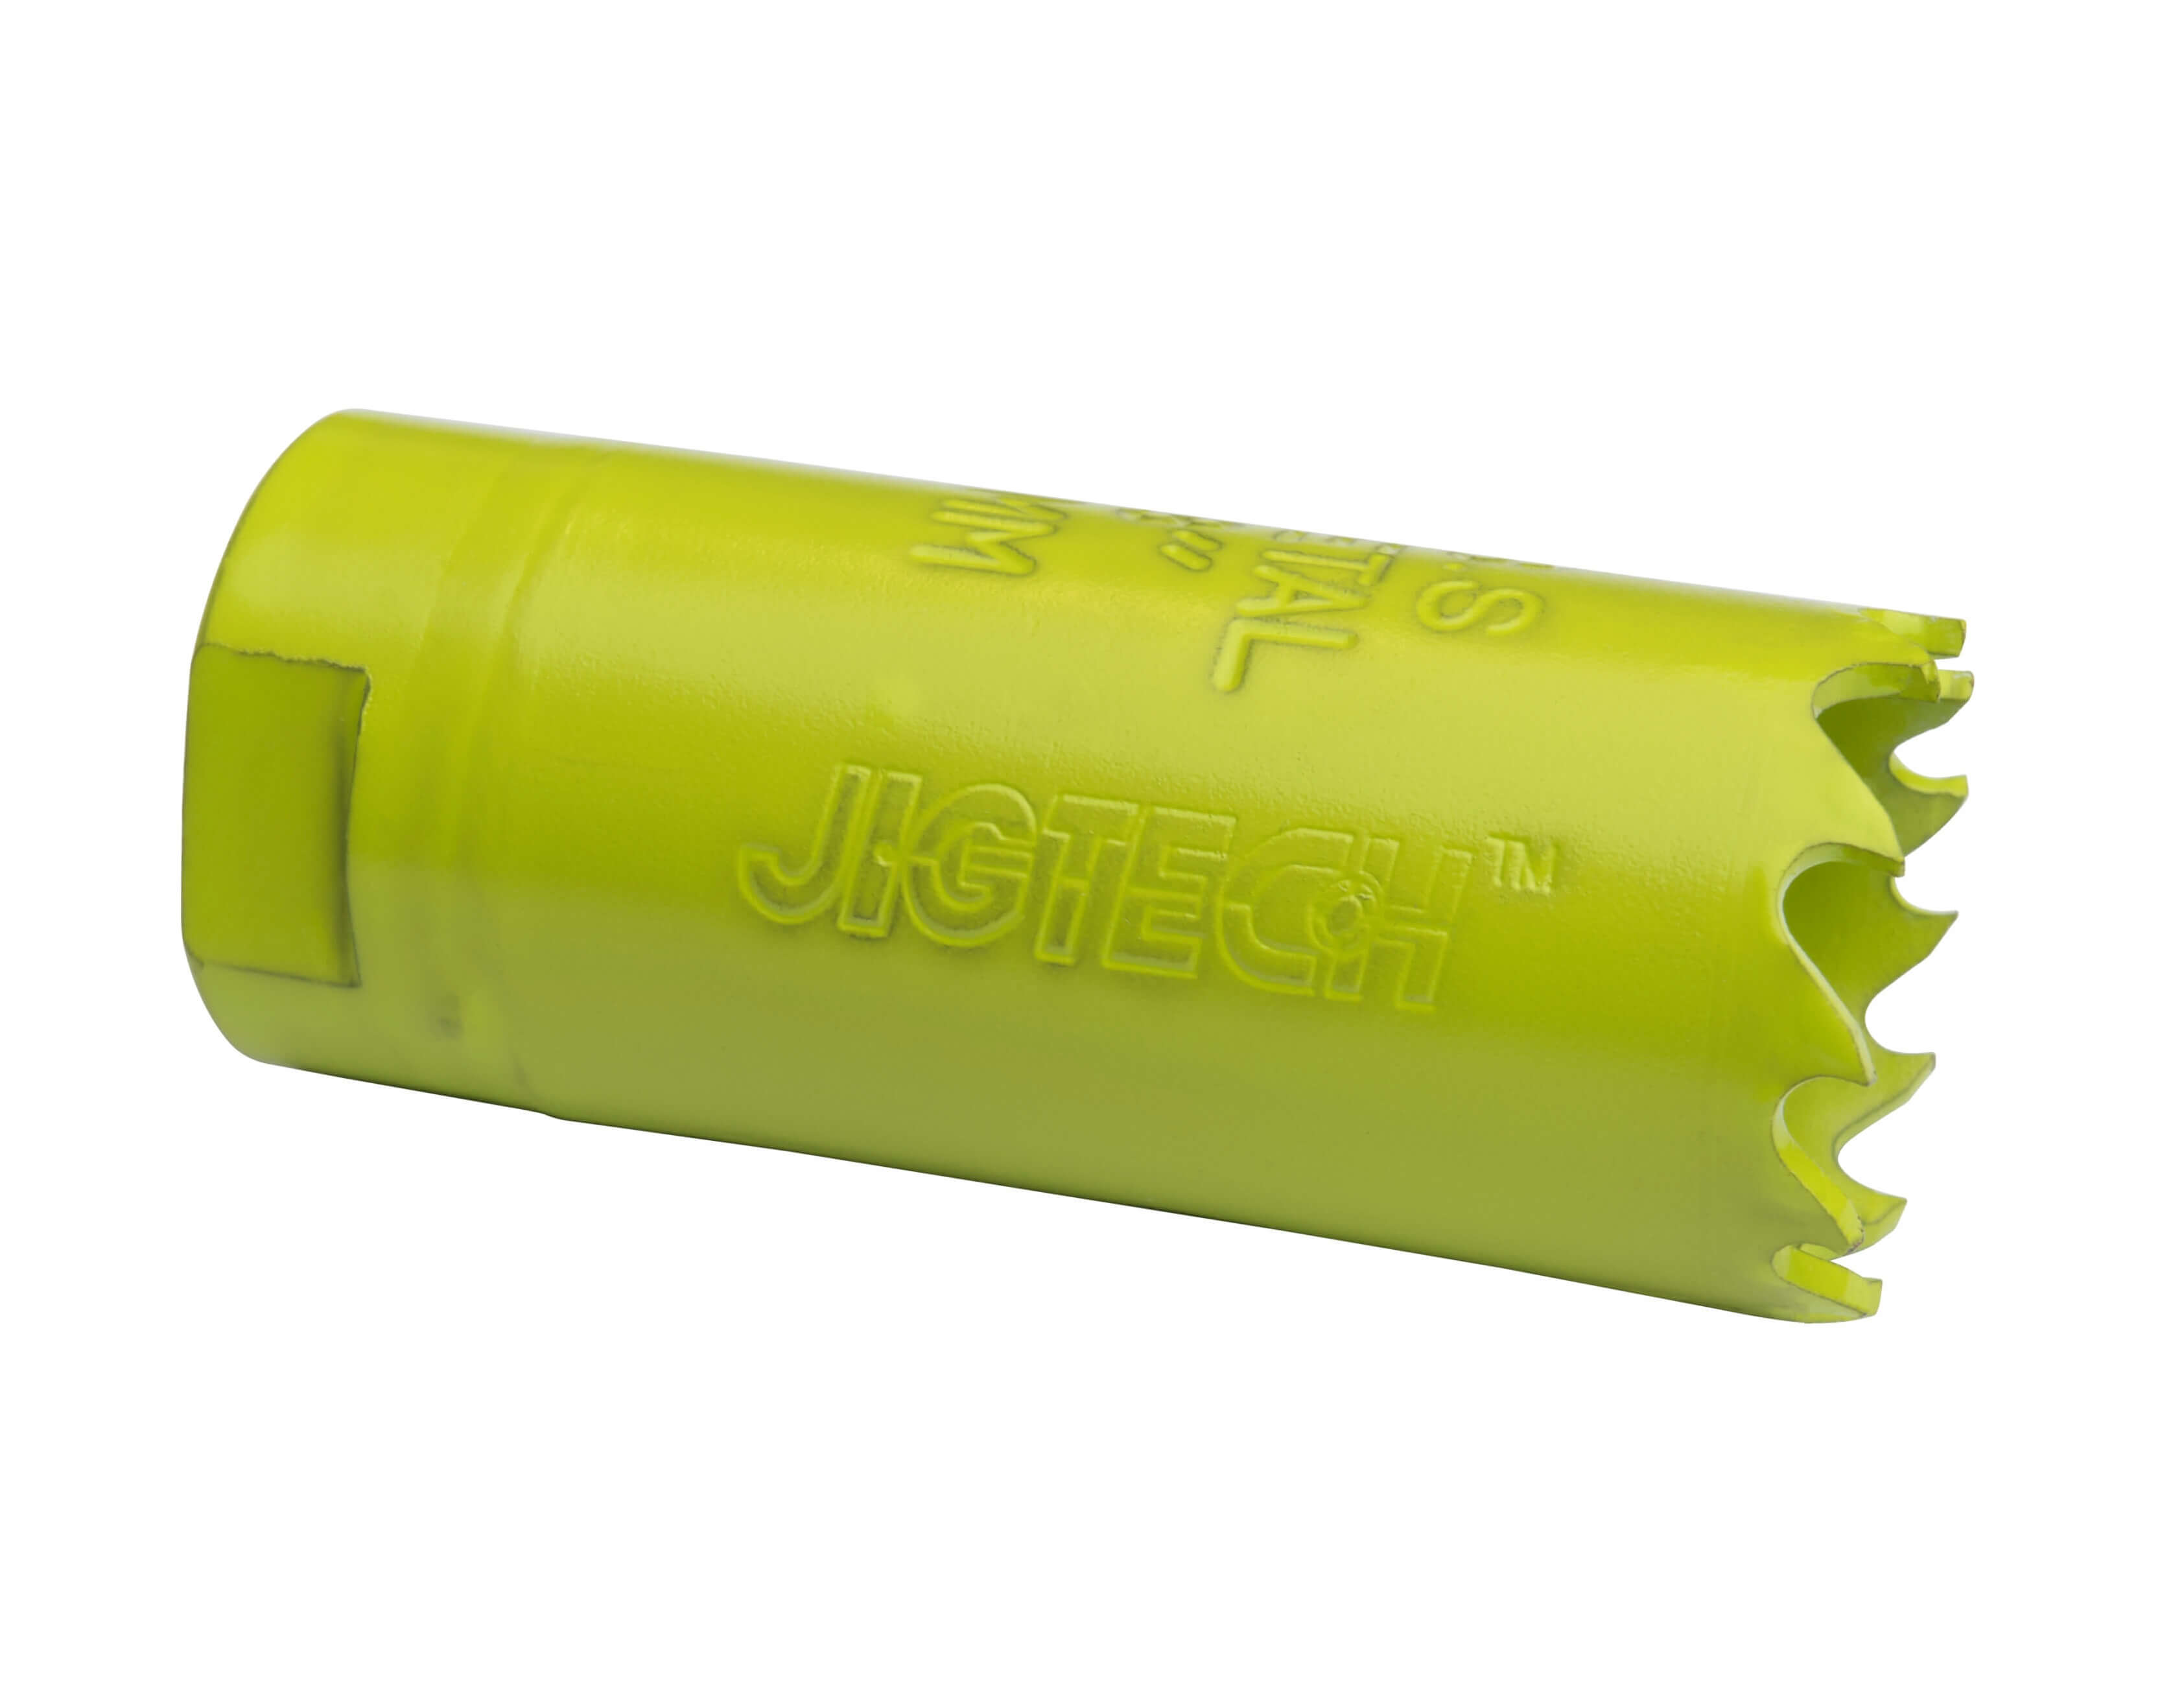 Jigtech 22mm Holesaw Only